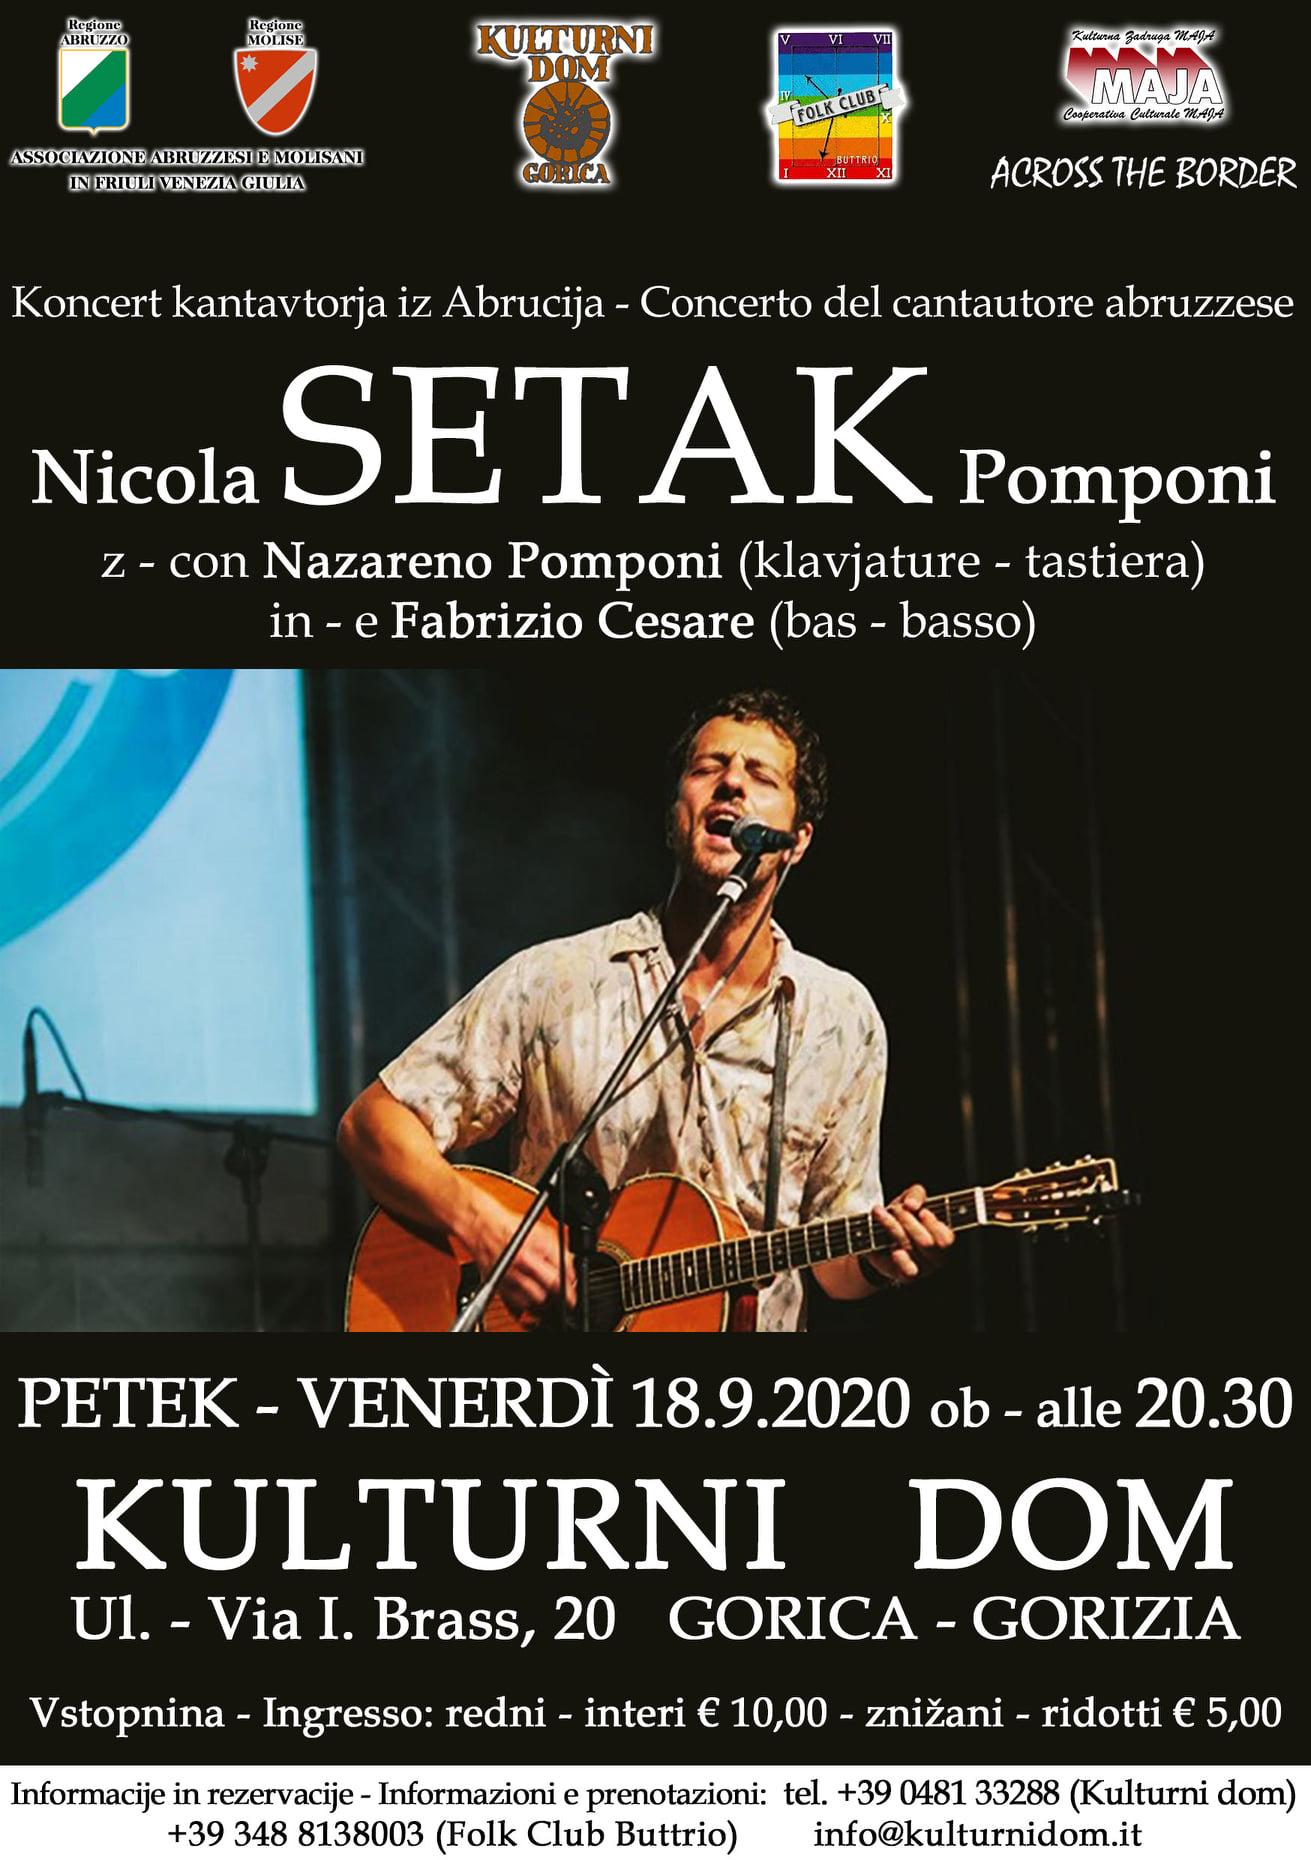 Setak in concert